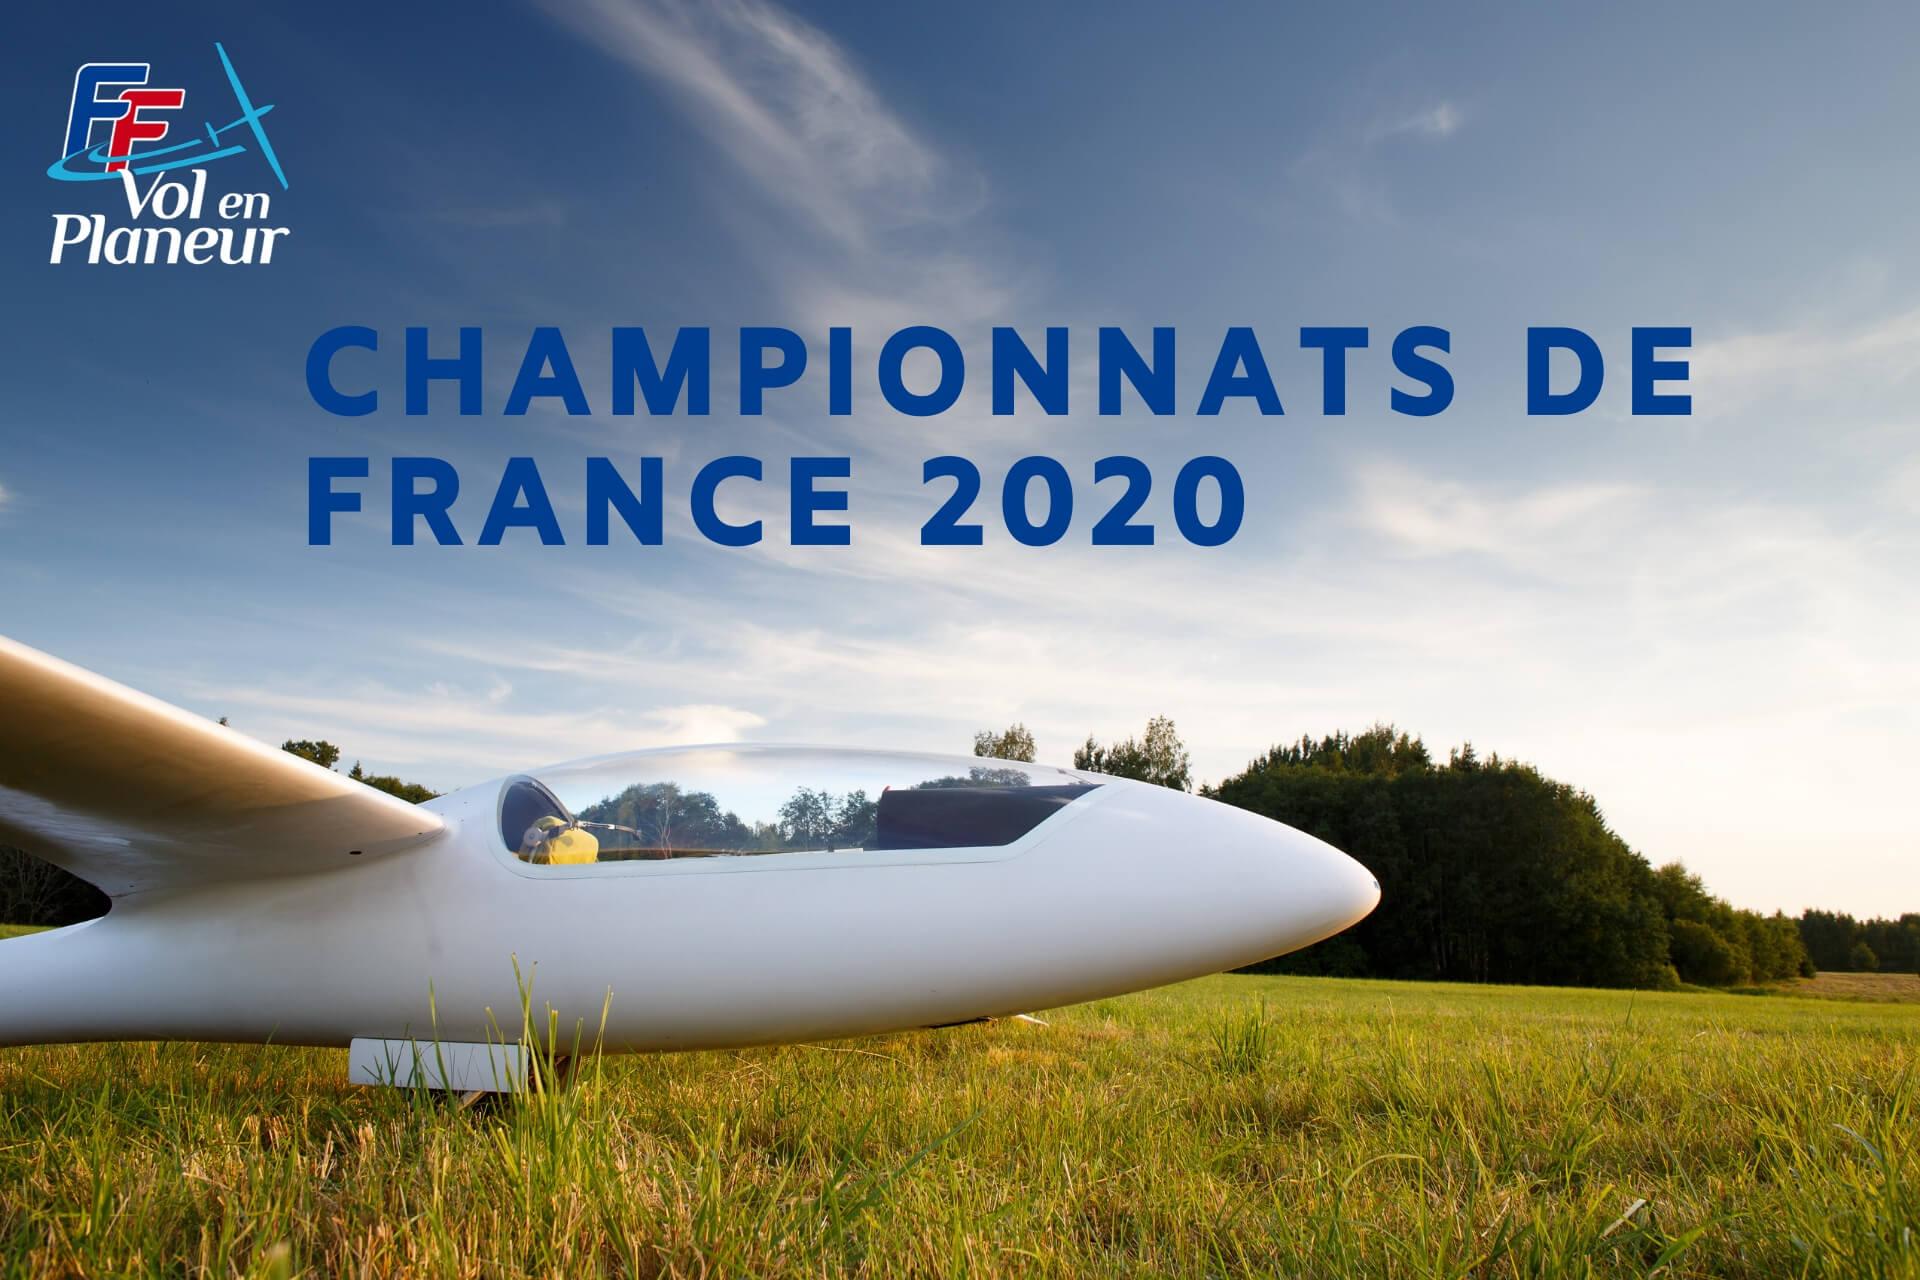 Validation des inscriptions en Championnat de France 2020